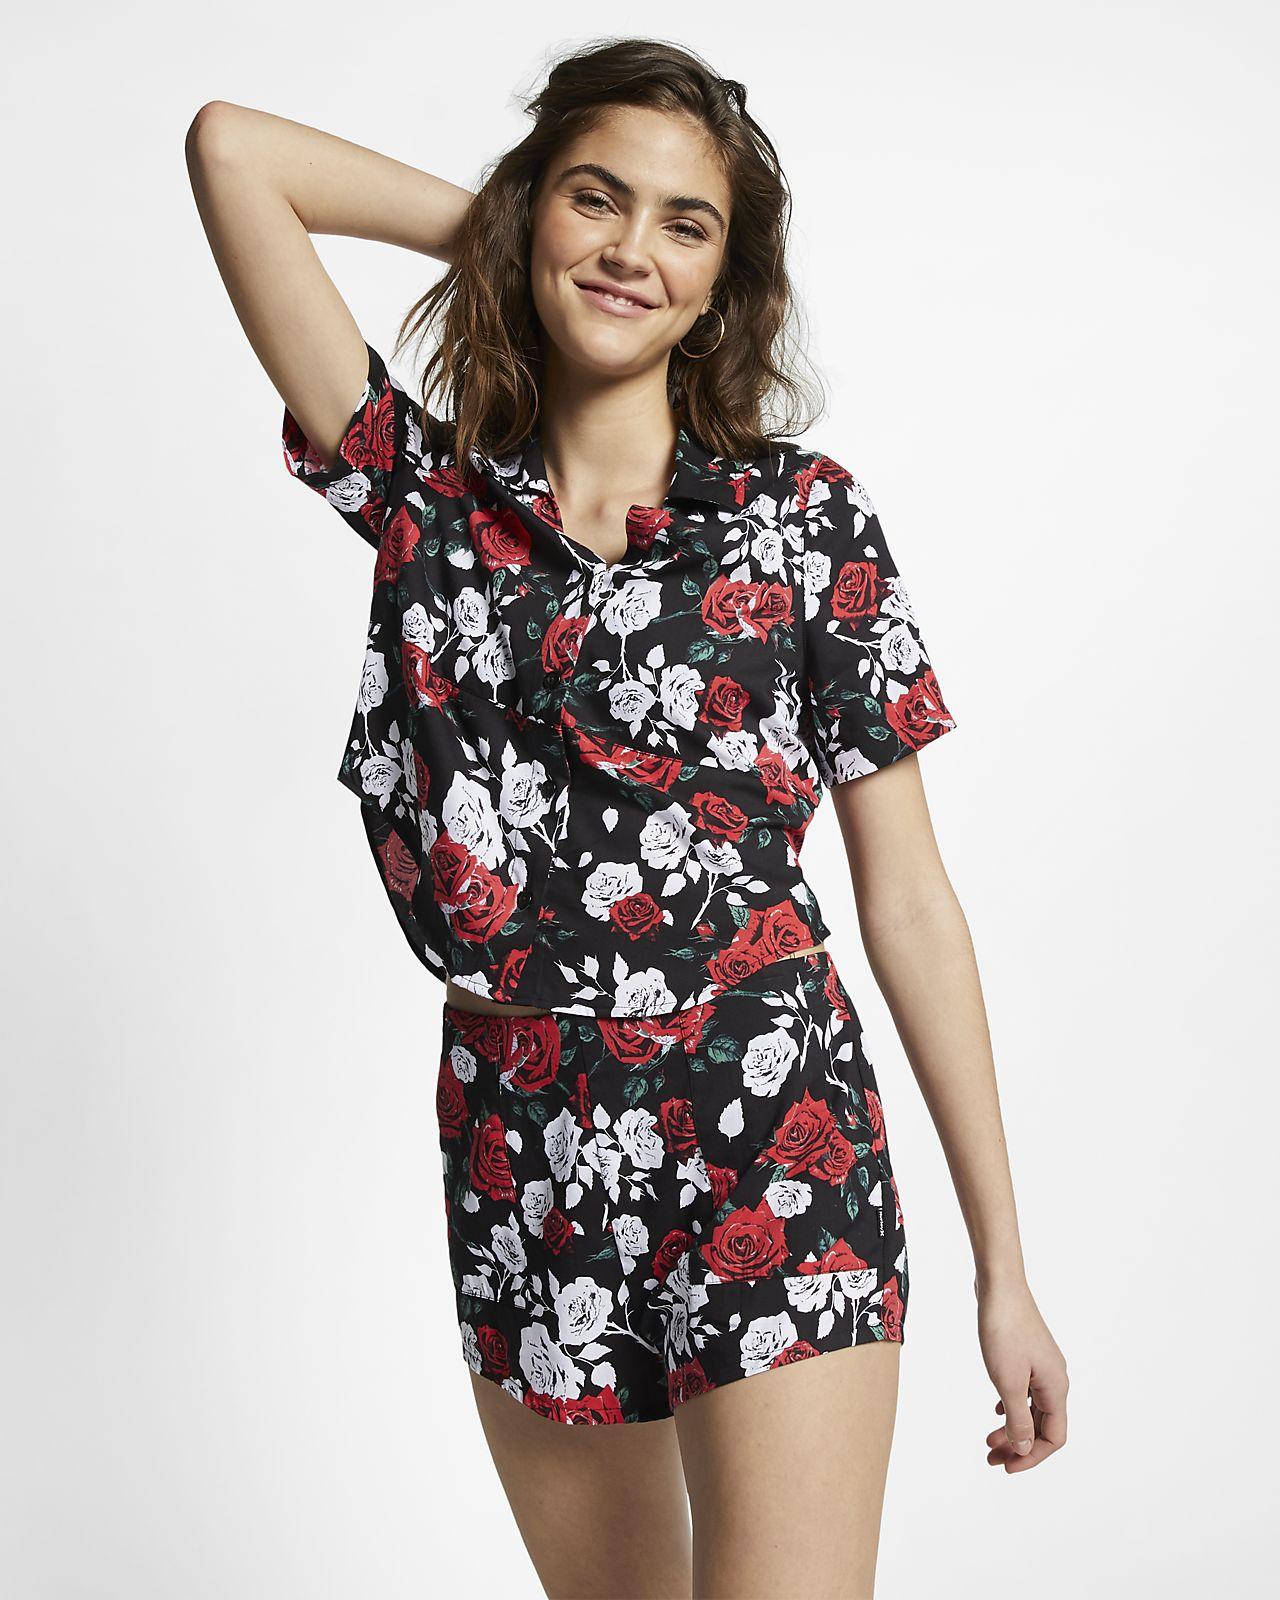 Hurley Wilson Rosez Women's Woven Short-Sleeve Top